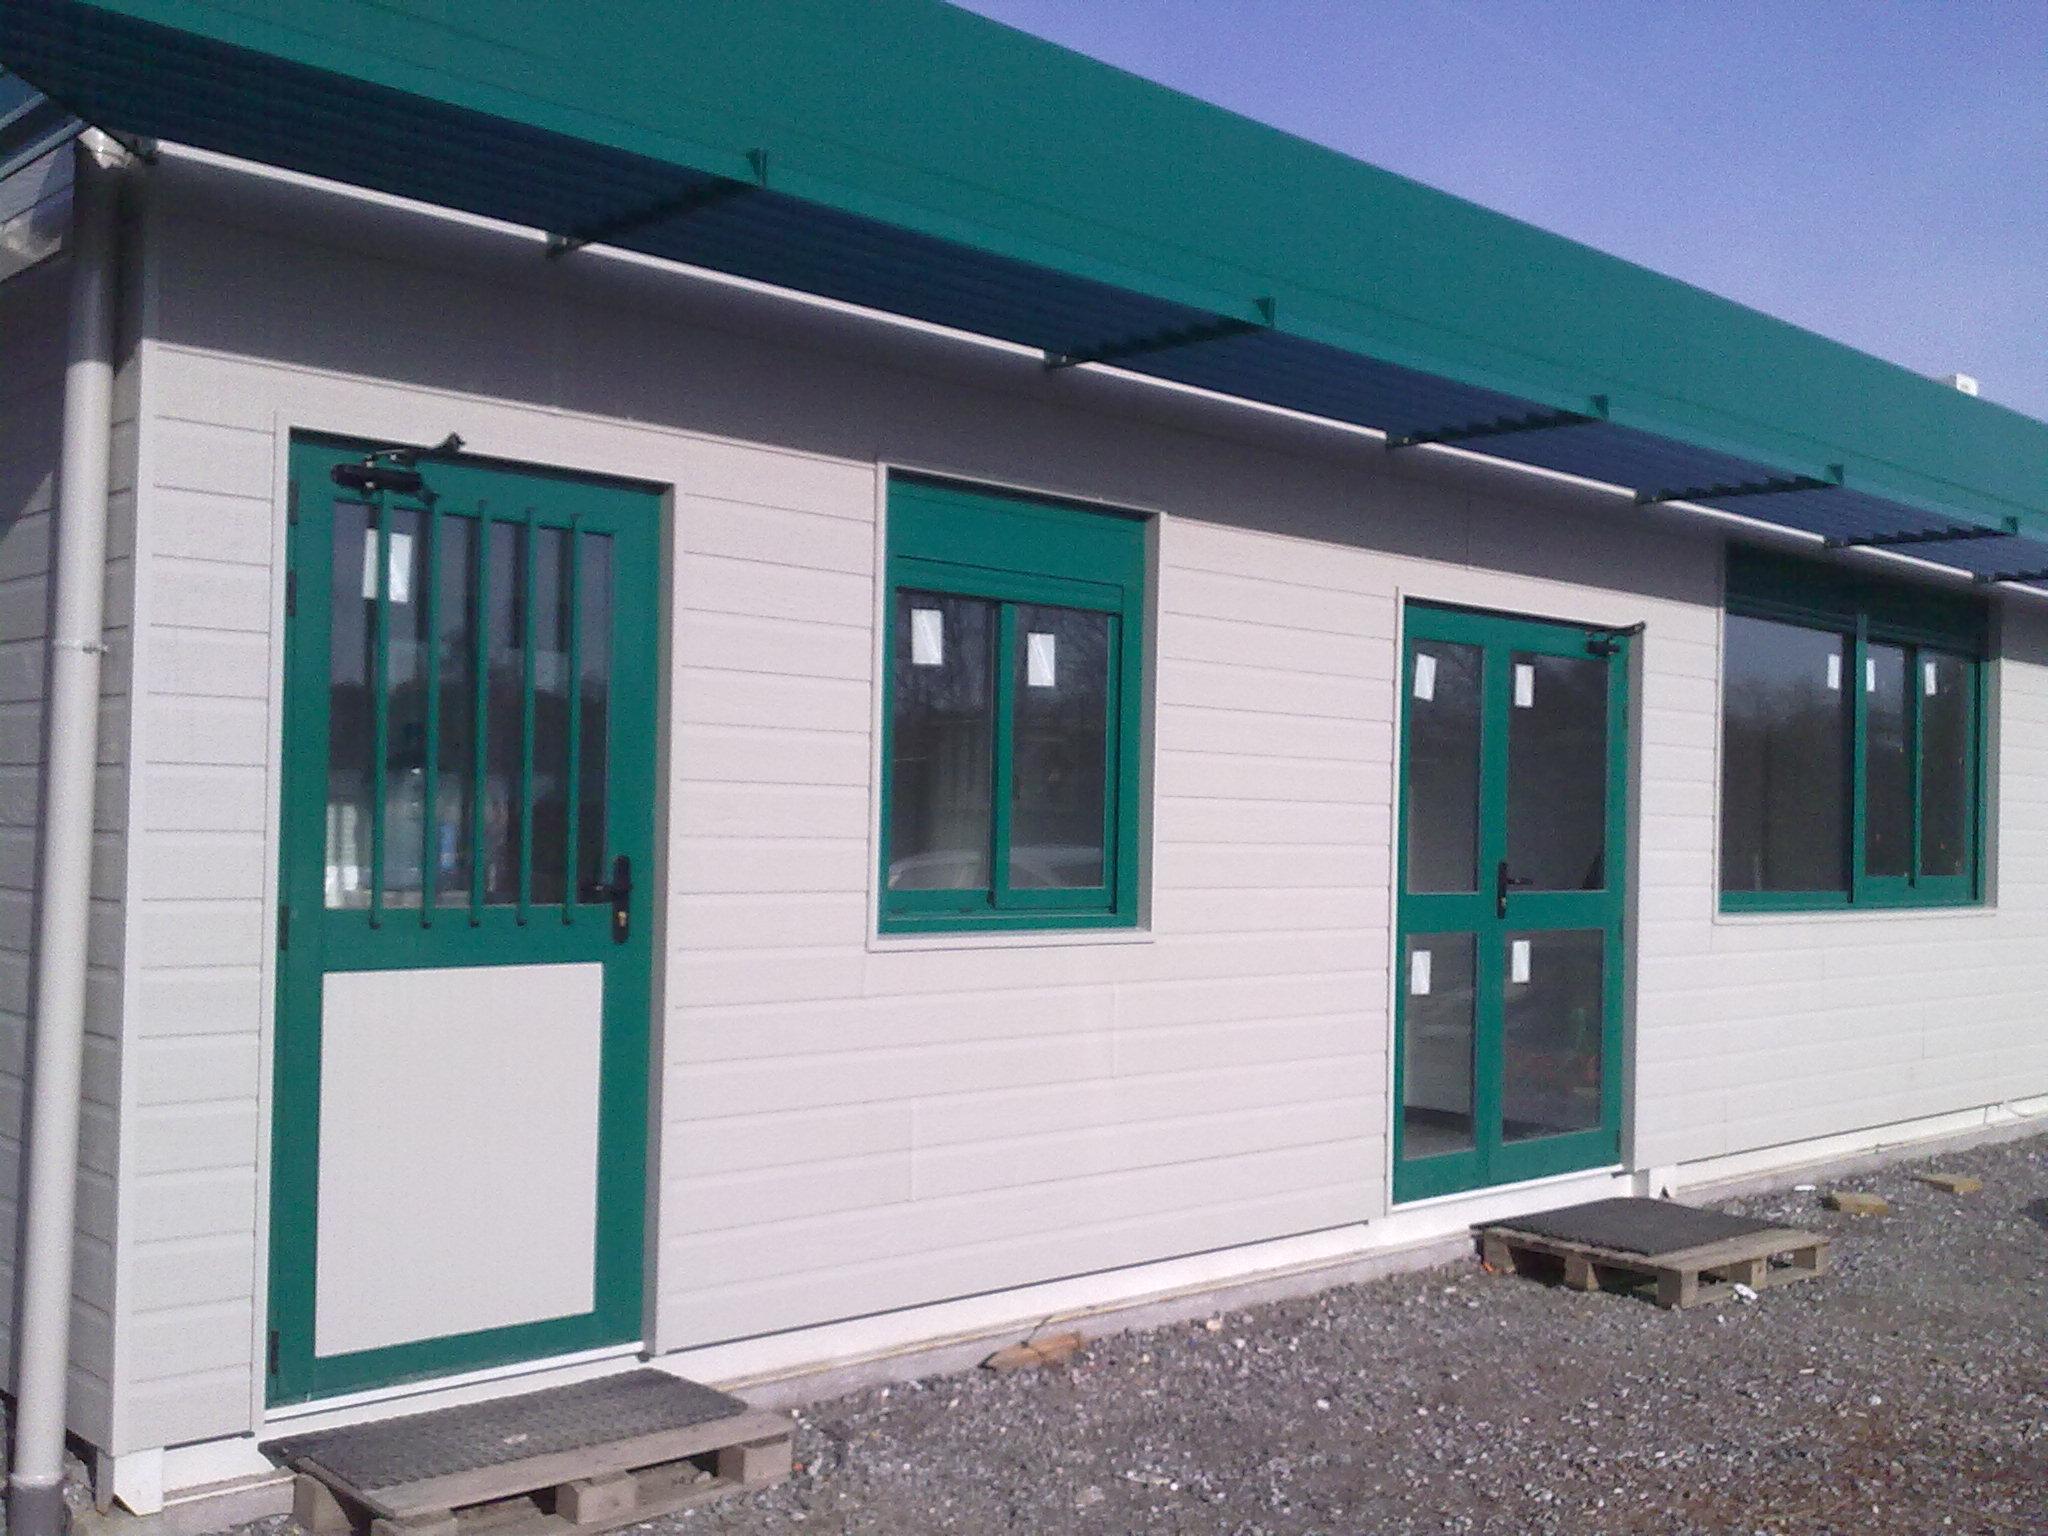 Oficinas prefabricadas oficinas modulares construcci n for Construccion de oficinas modulares